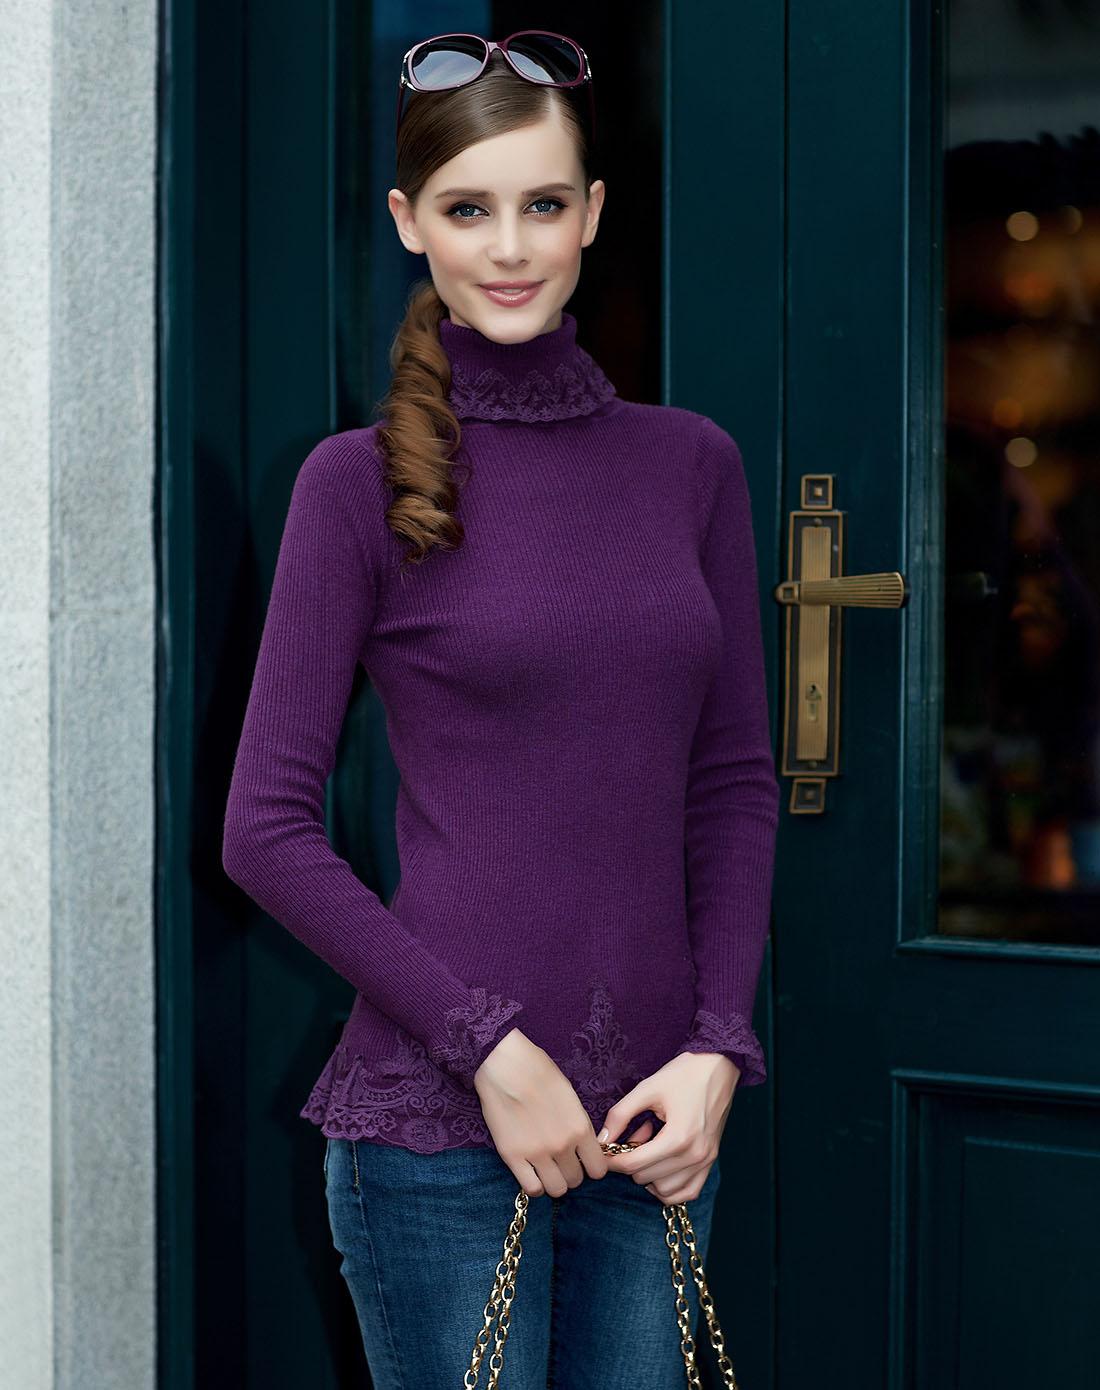 osa紫色蕾丝高领打底衫se350068000a